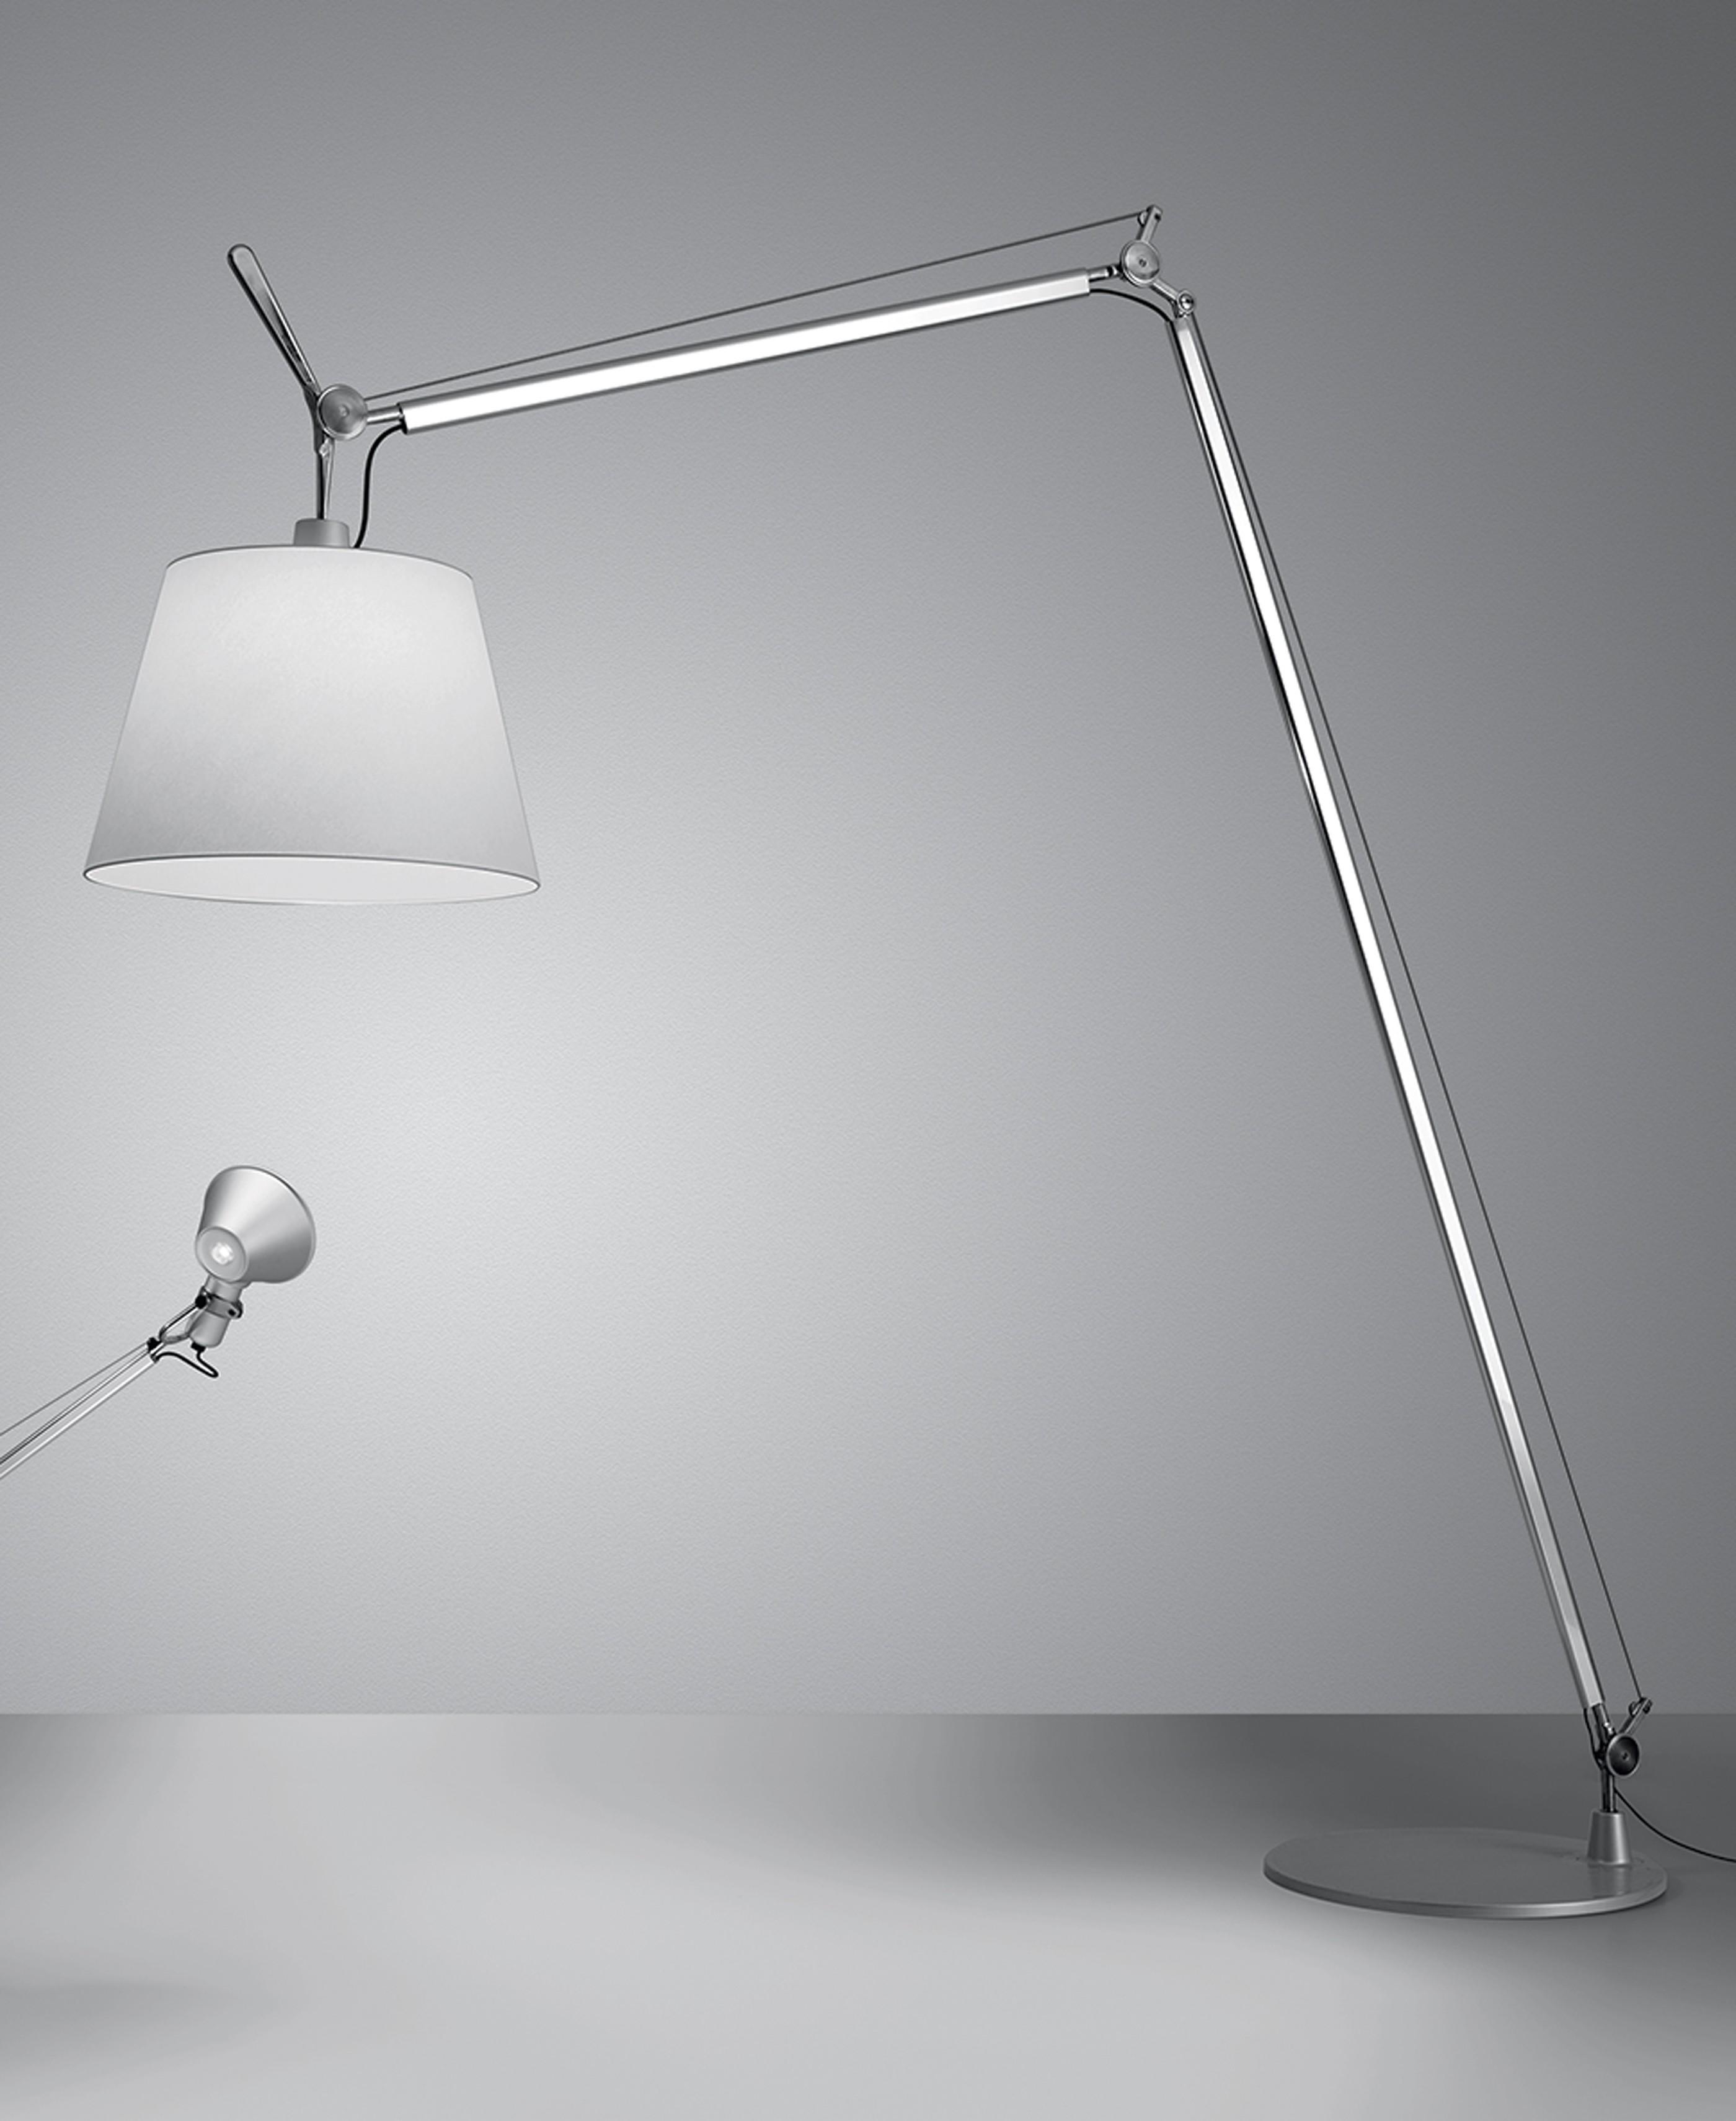 Prediger Lampen  Lampen Prediger In Hamburg – Wohn design